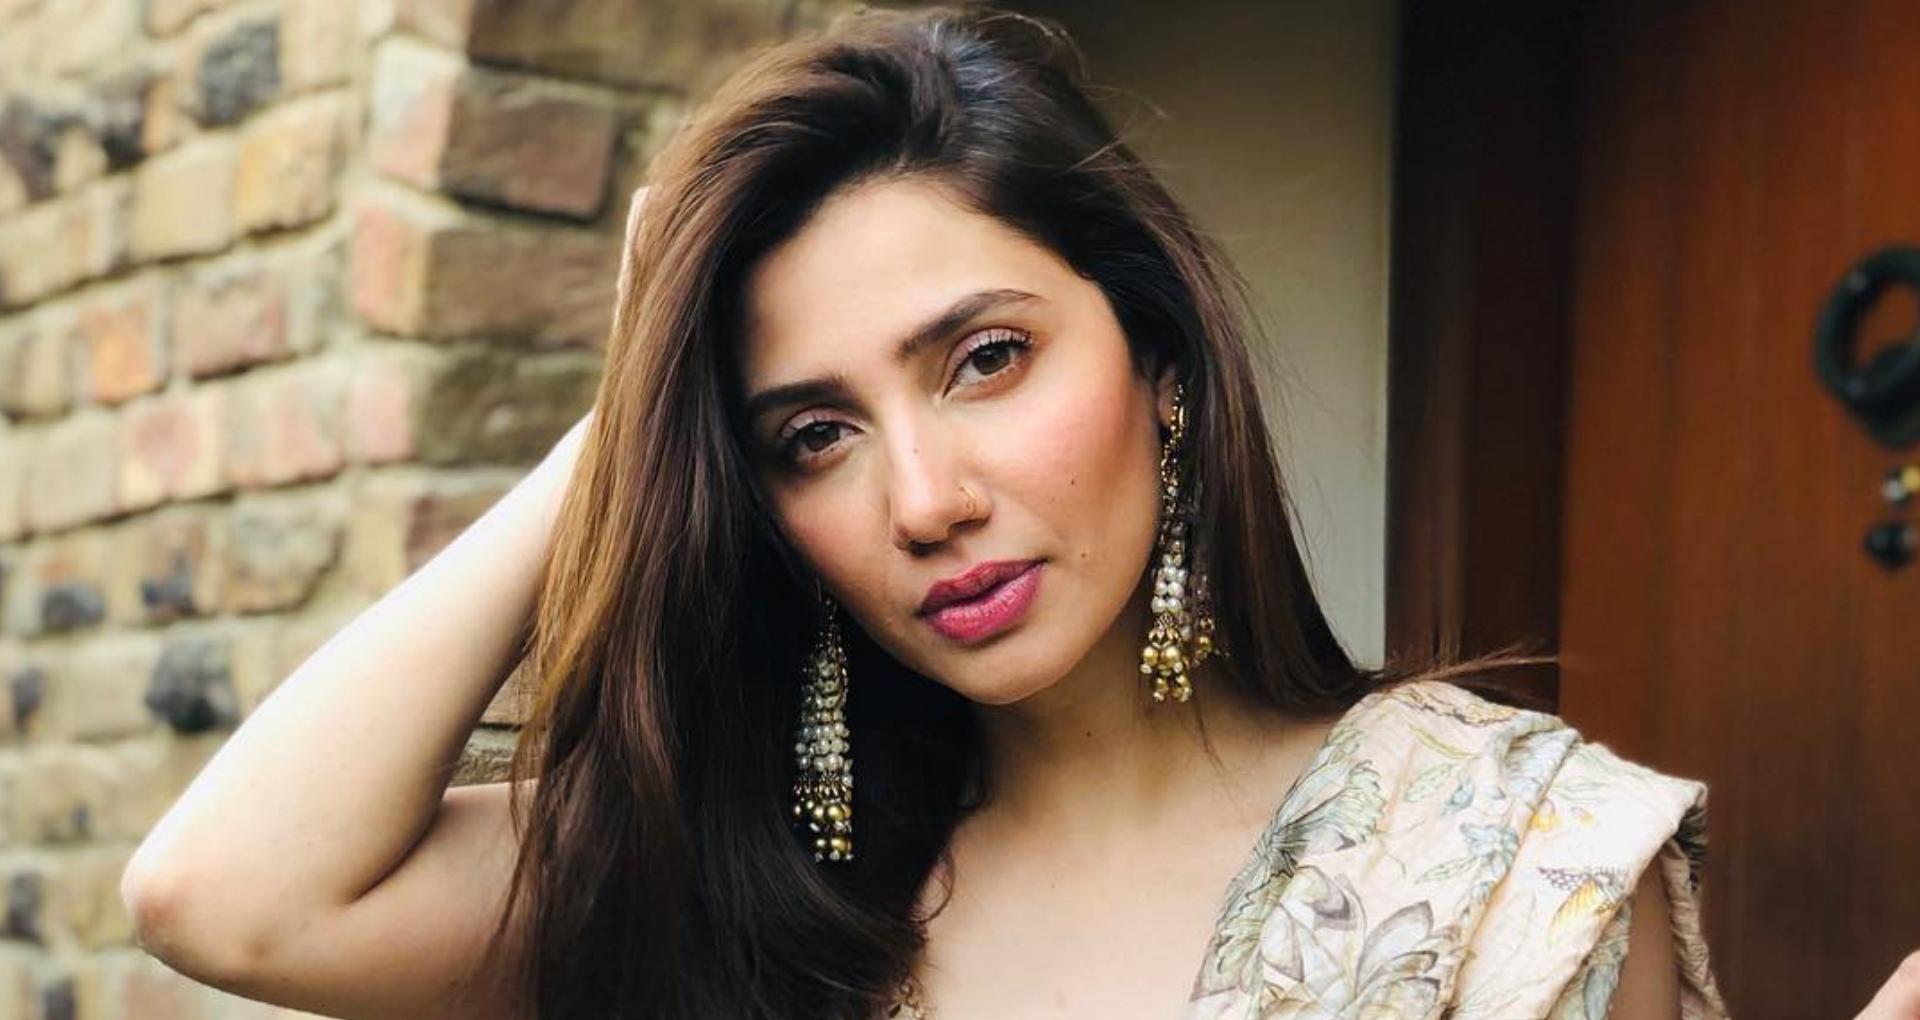 Mahira khan: सिरदर्द से परेशान पाकिस्तानी एक्ट्रेस माहिरा खान ने ट्वीट कर फैन्स से मांगी मदद, यहाँ देखे ट्वीट